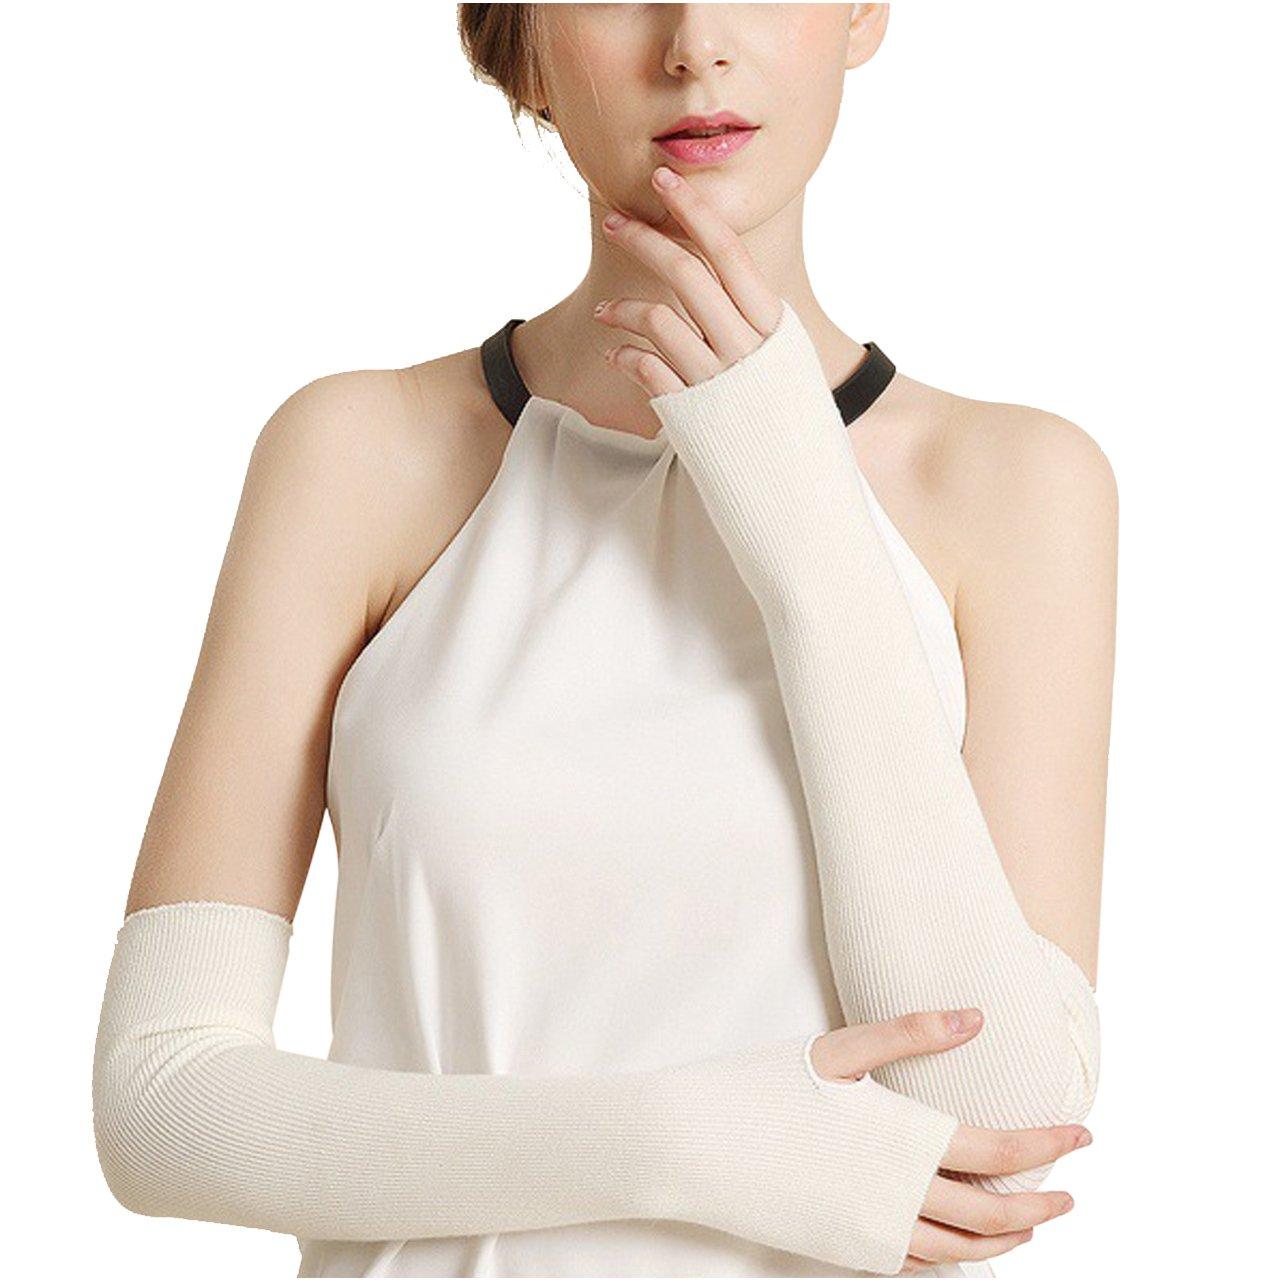 CHIC DIARY Women Fashion Arm Warmer Thumbhole Long Fingerless Gloves (02-Off white)